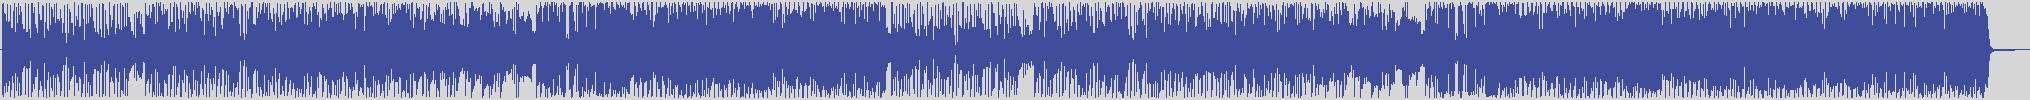 smilax_dig_records [Smilax_X448DIG] Stefy - Le Tagliatelle Di Nonna Pina [Original Mix] audio wave form